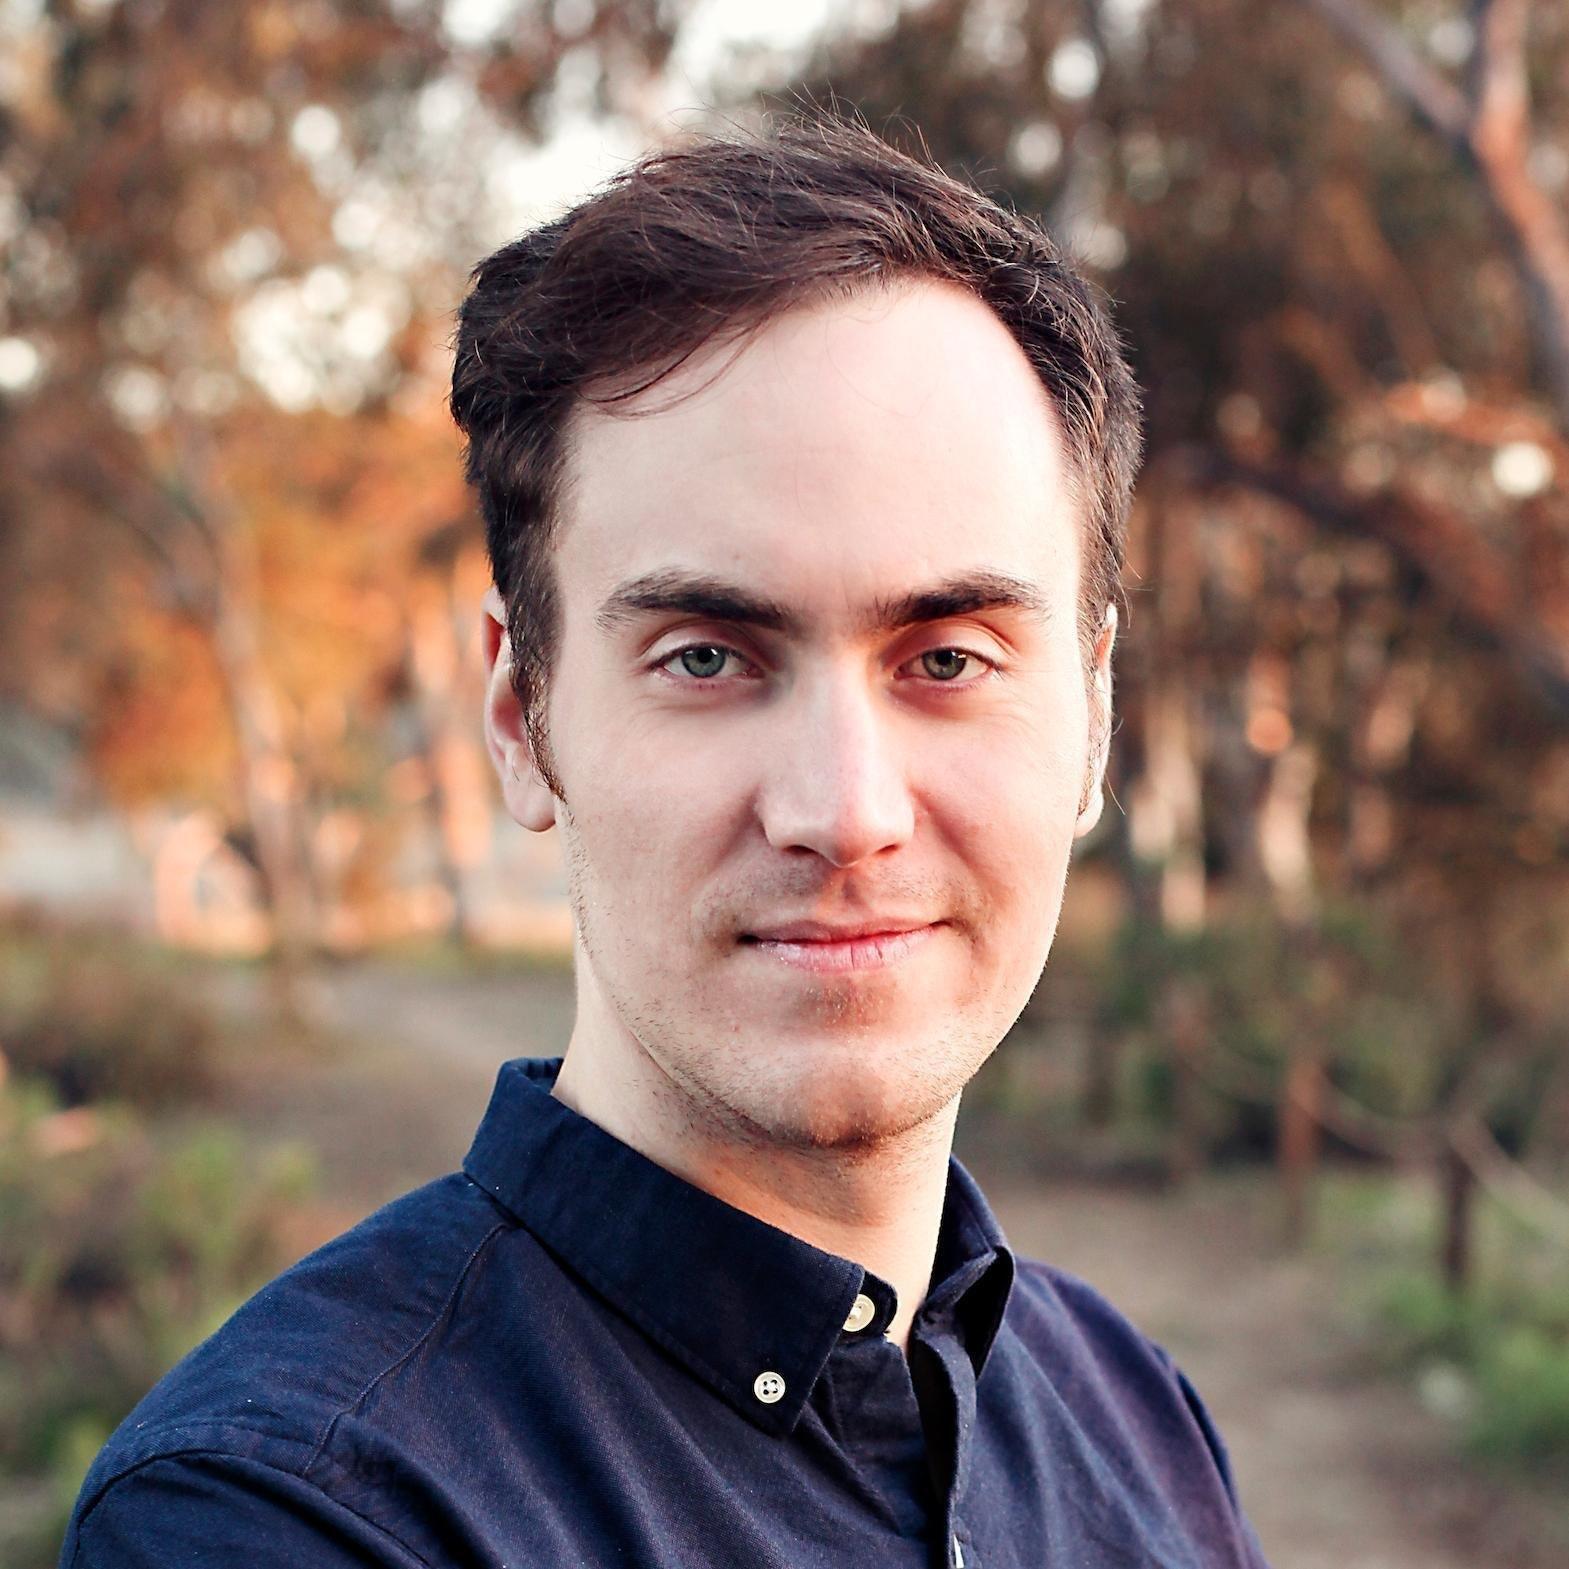 Cameron Woodmansee